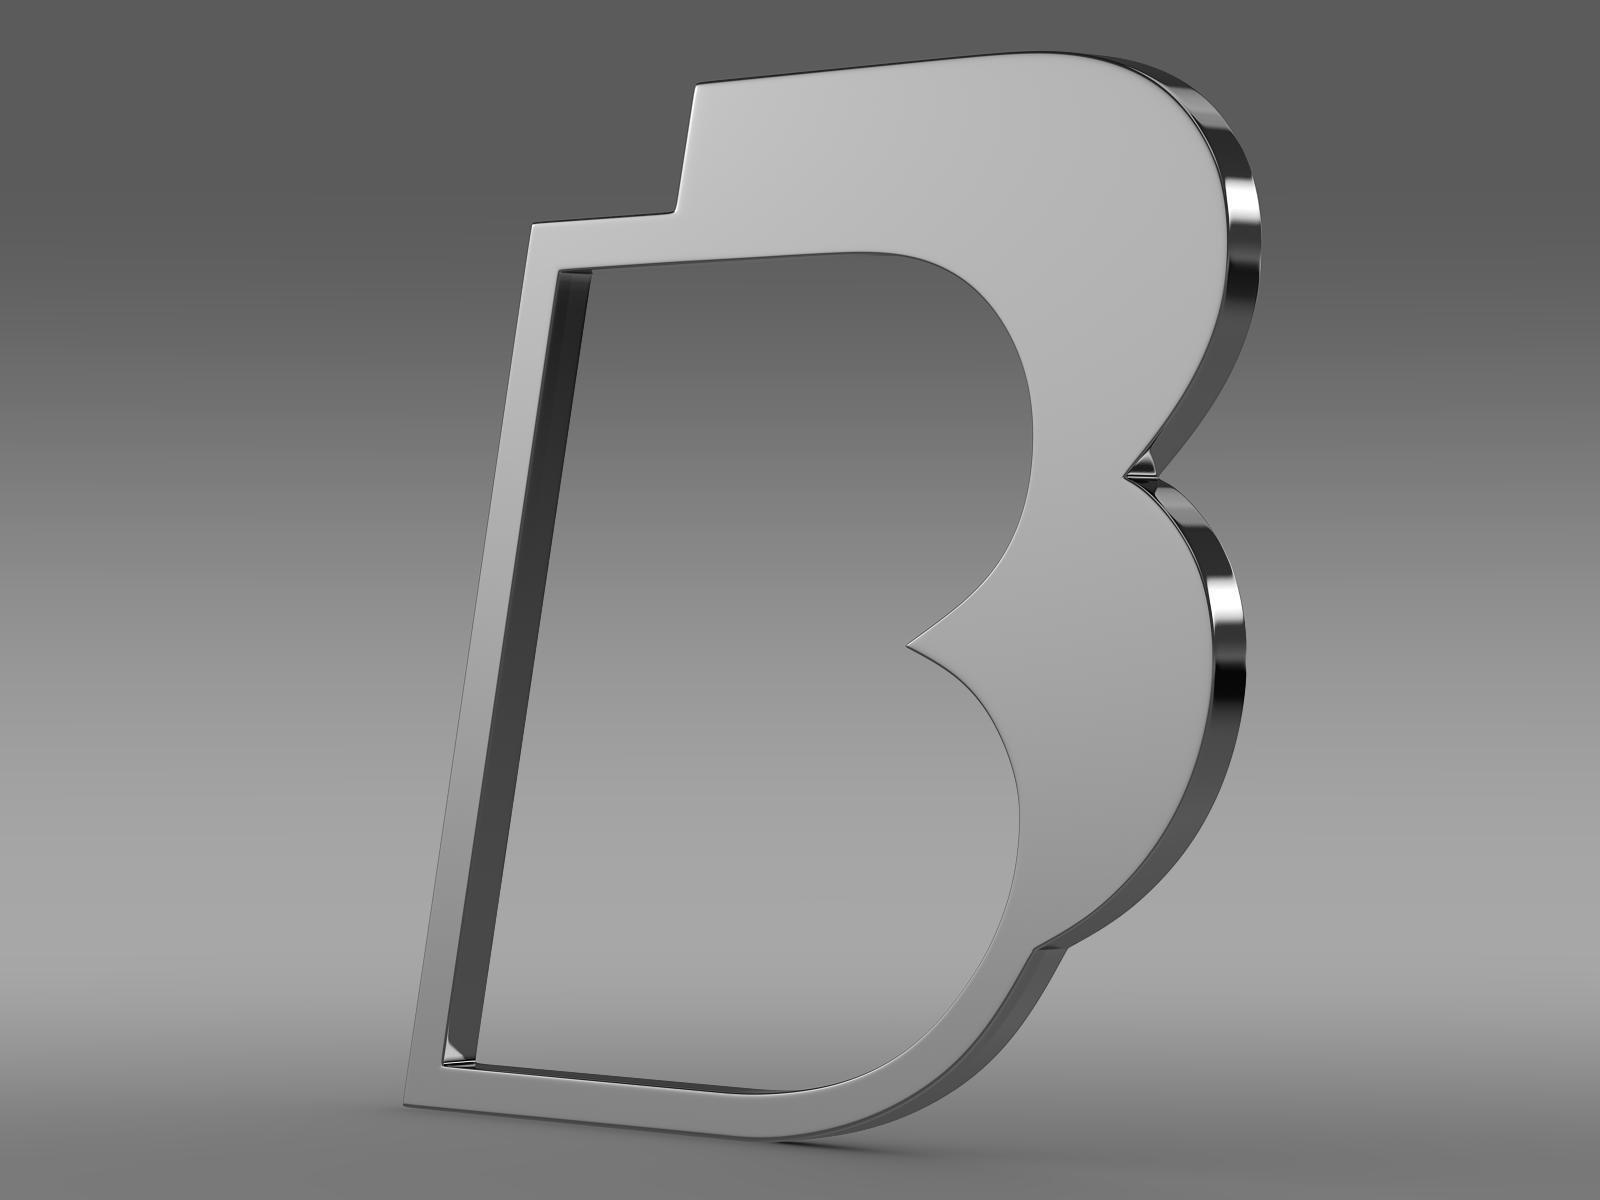 BB logo 3d model 3ds max fbx lwo lws lw ma mb  obj 208208